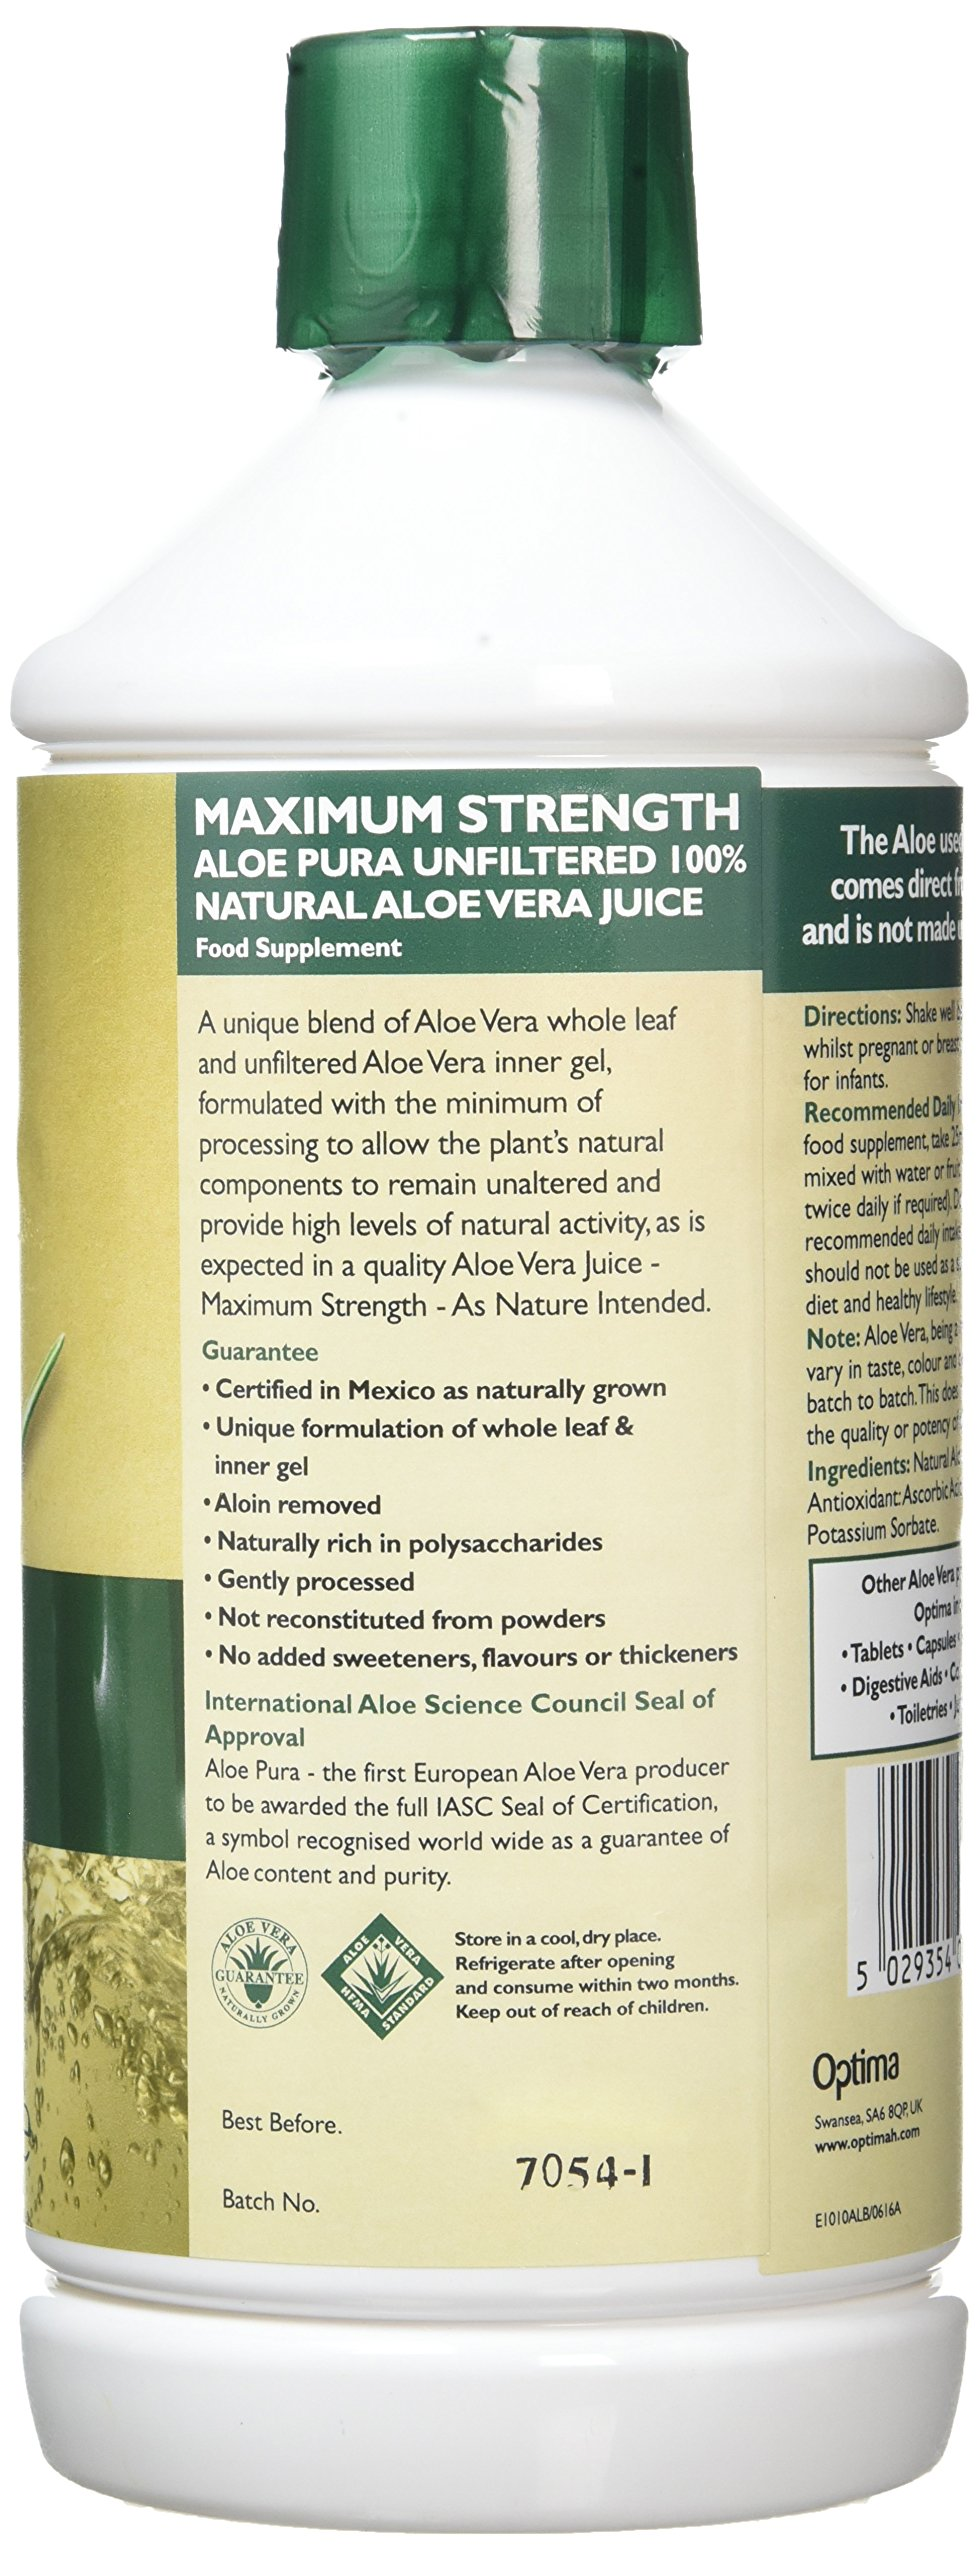 Aloe Vera Juice Max Strength - 1litre 5